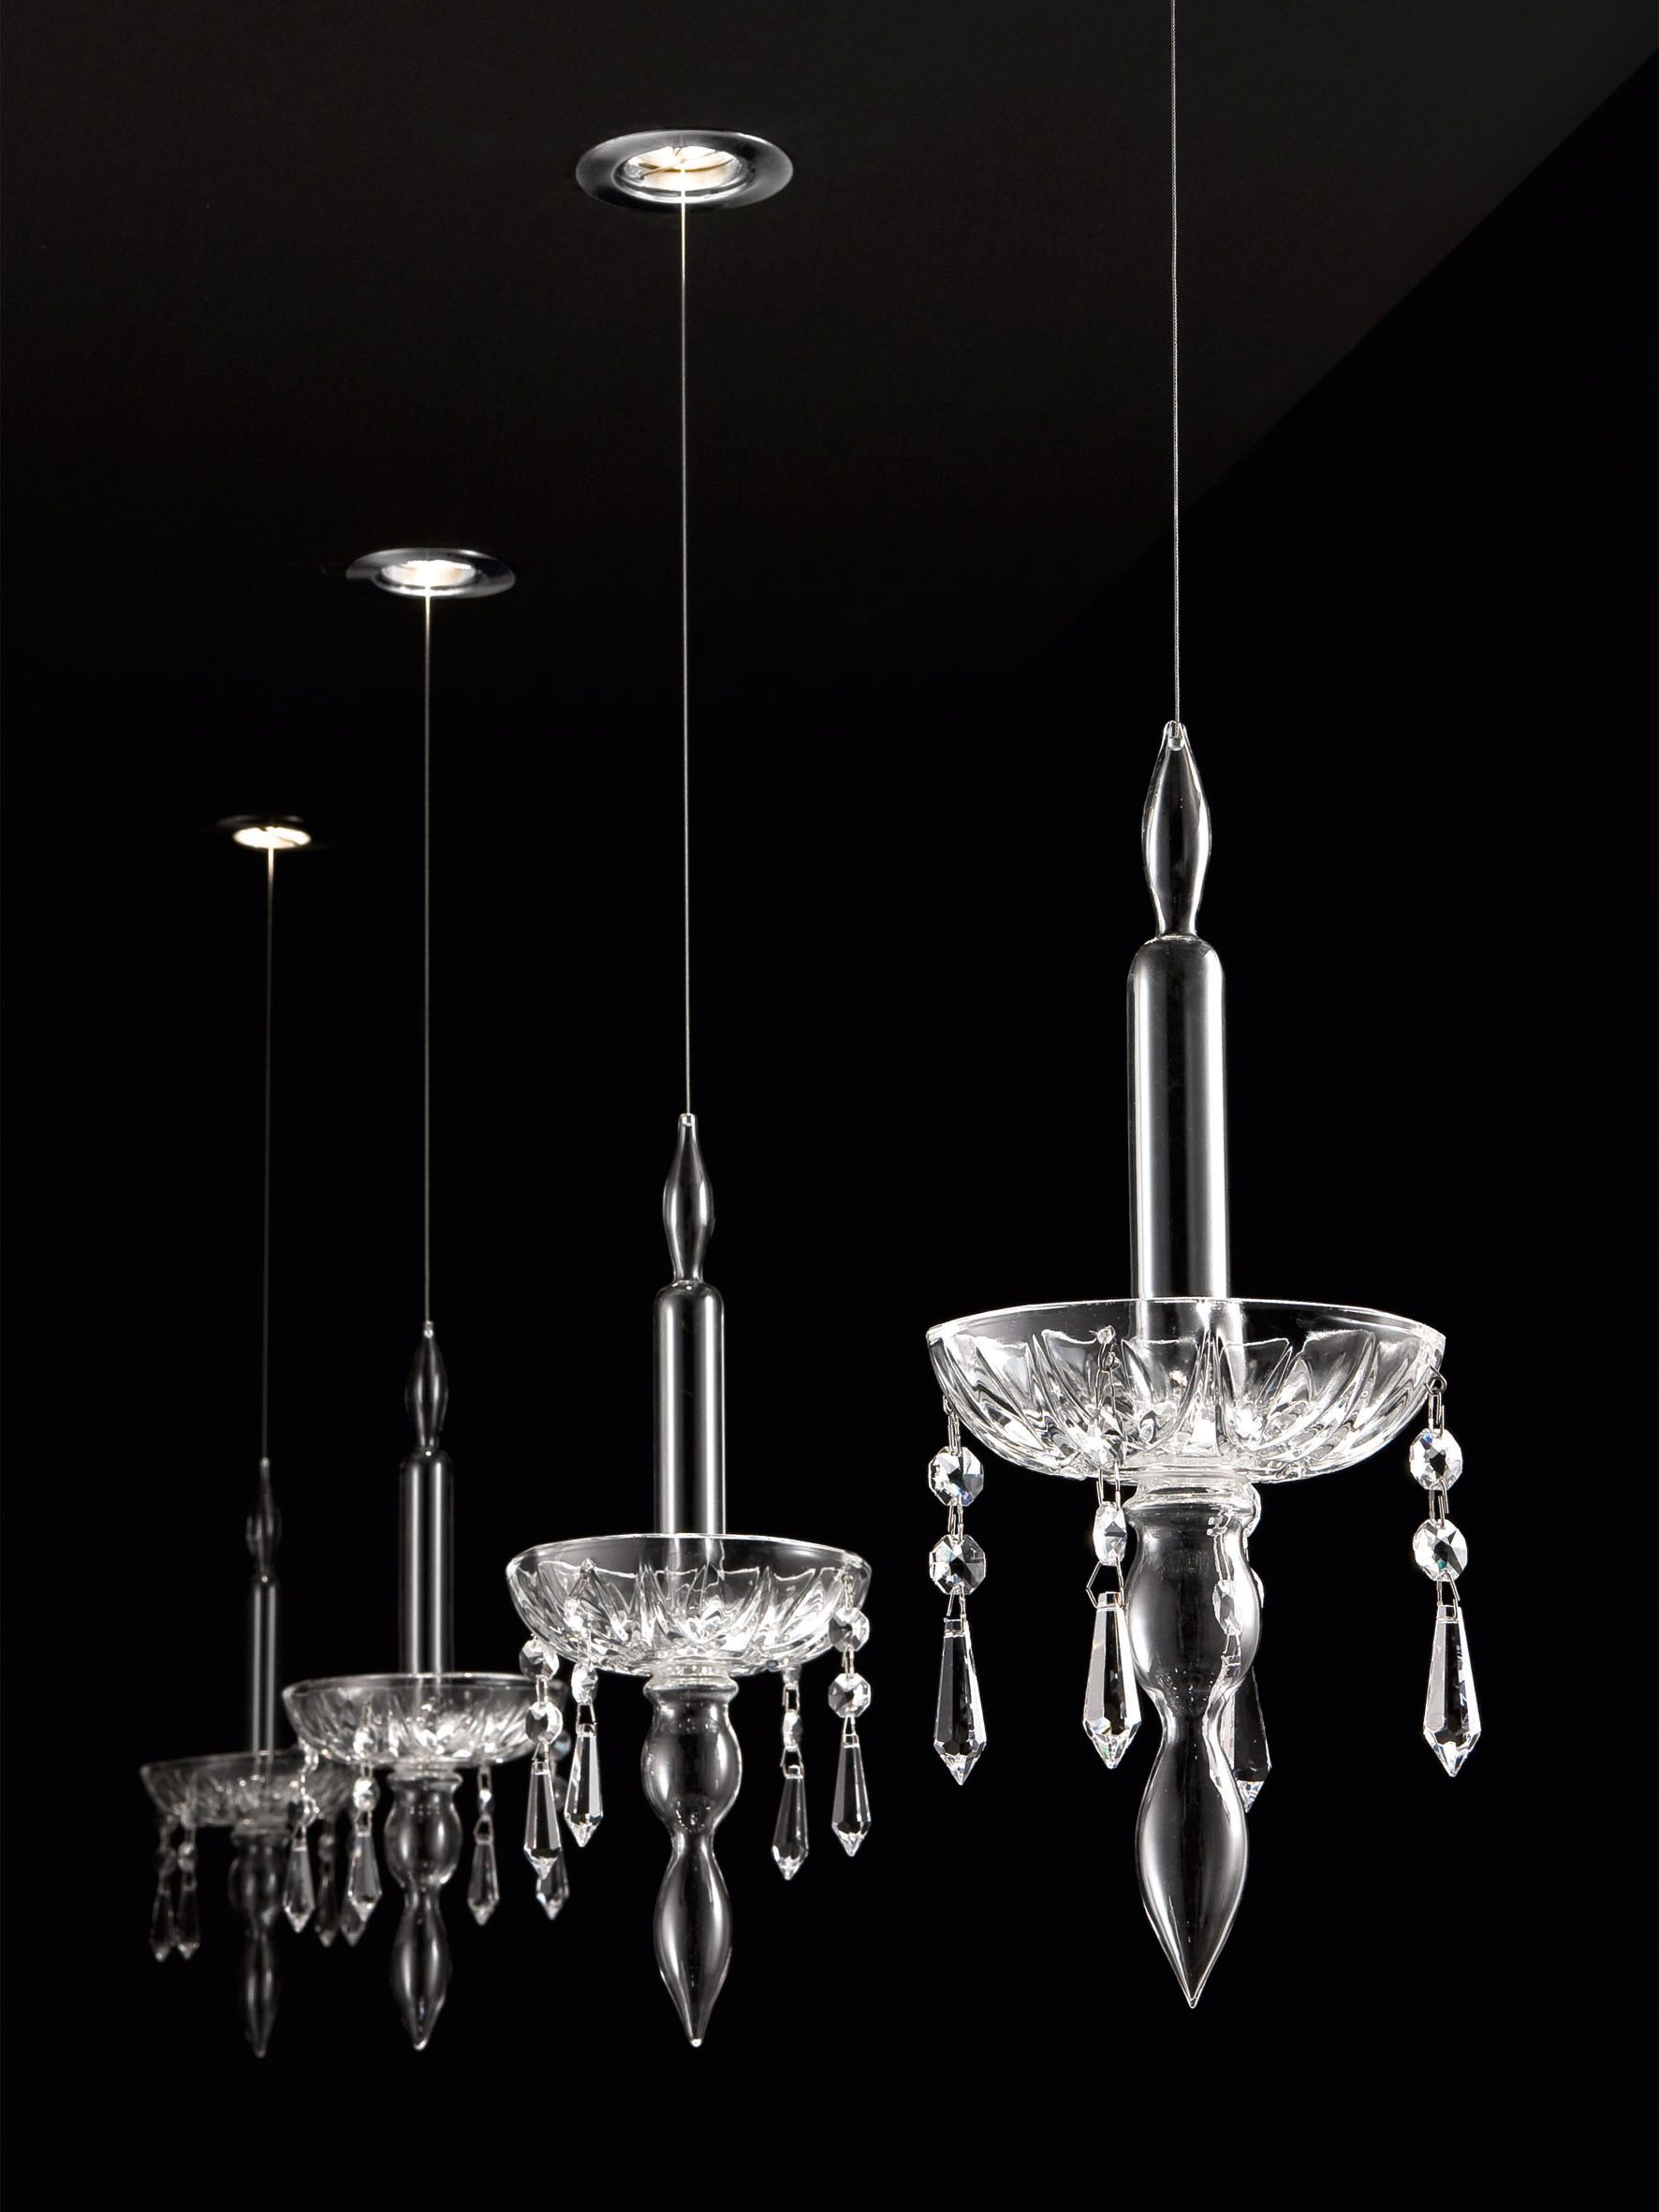 Limelight design by lorenzo bertocco deconstructed chandelier in limelight design by lorenzo bertocco deconstructed chandelier in crystal glass light4 design arubaitofo Images